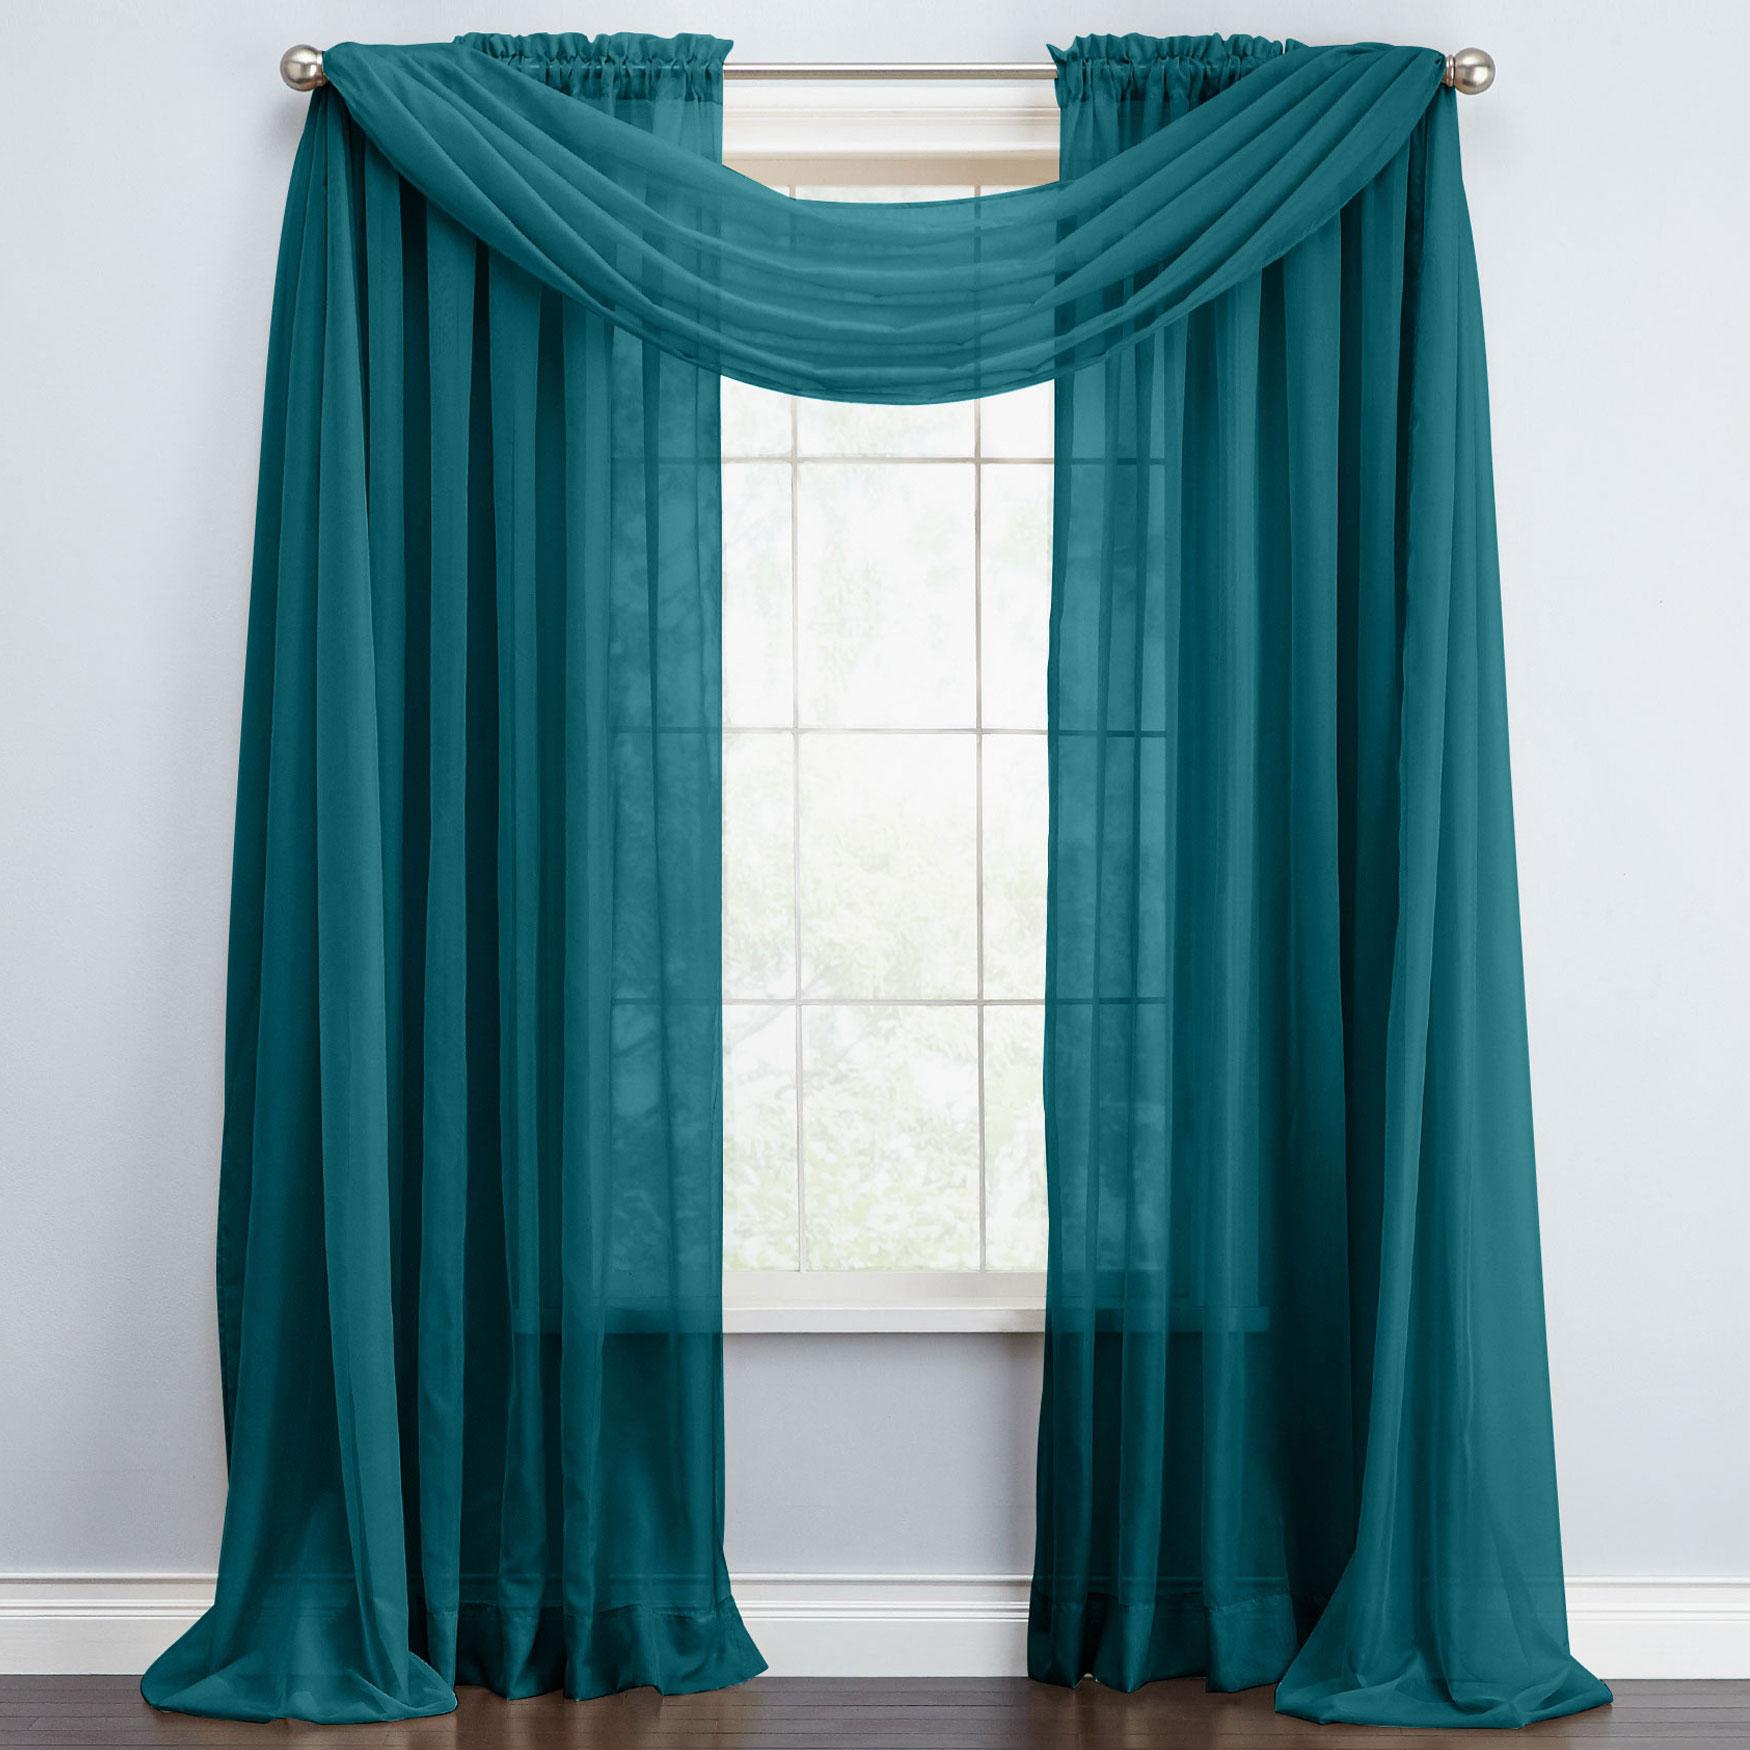 Bh Studio Sheer Voile Scarf Valance Window